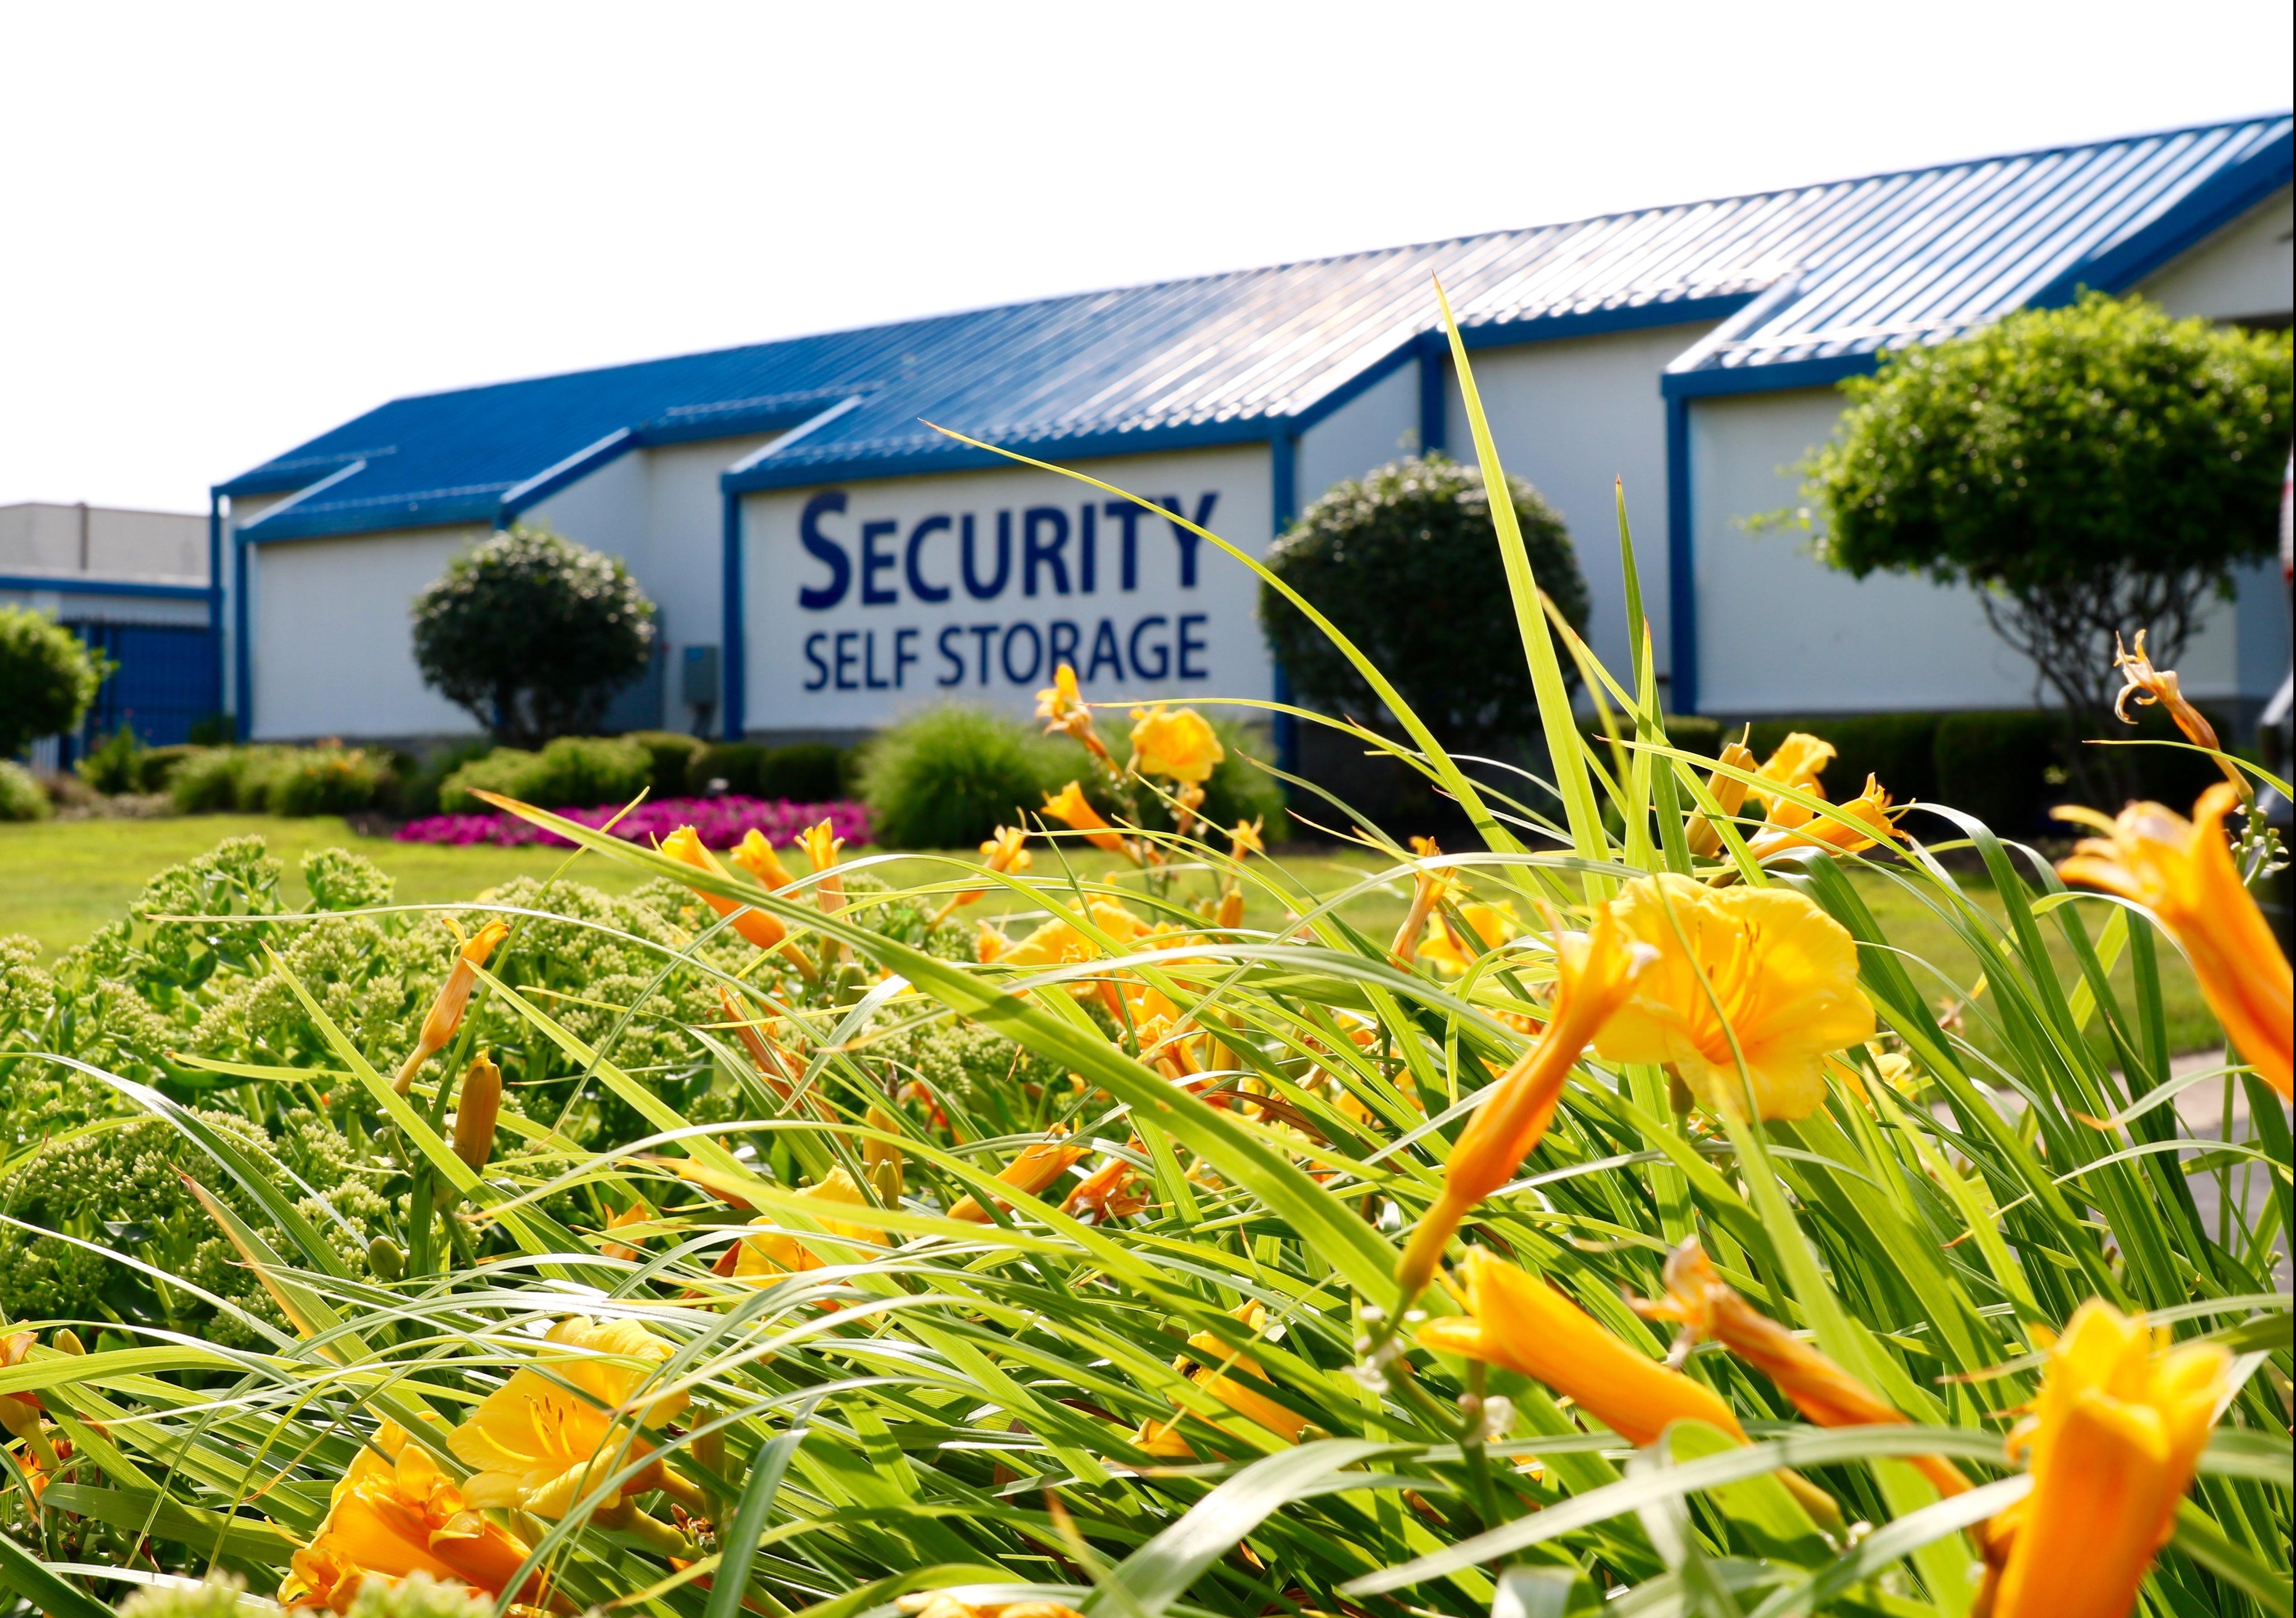 Security Self Storage image 2